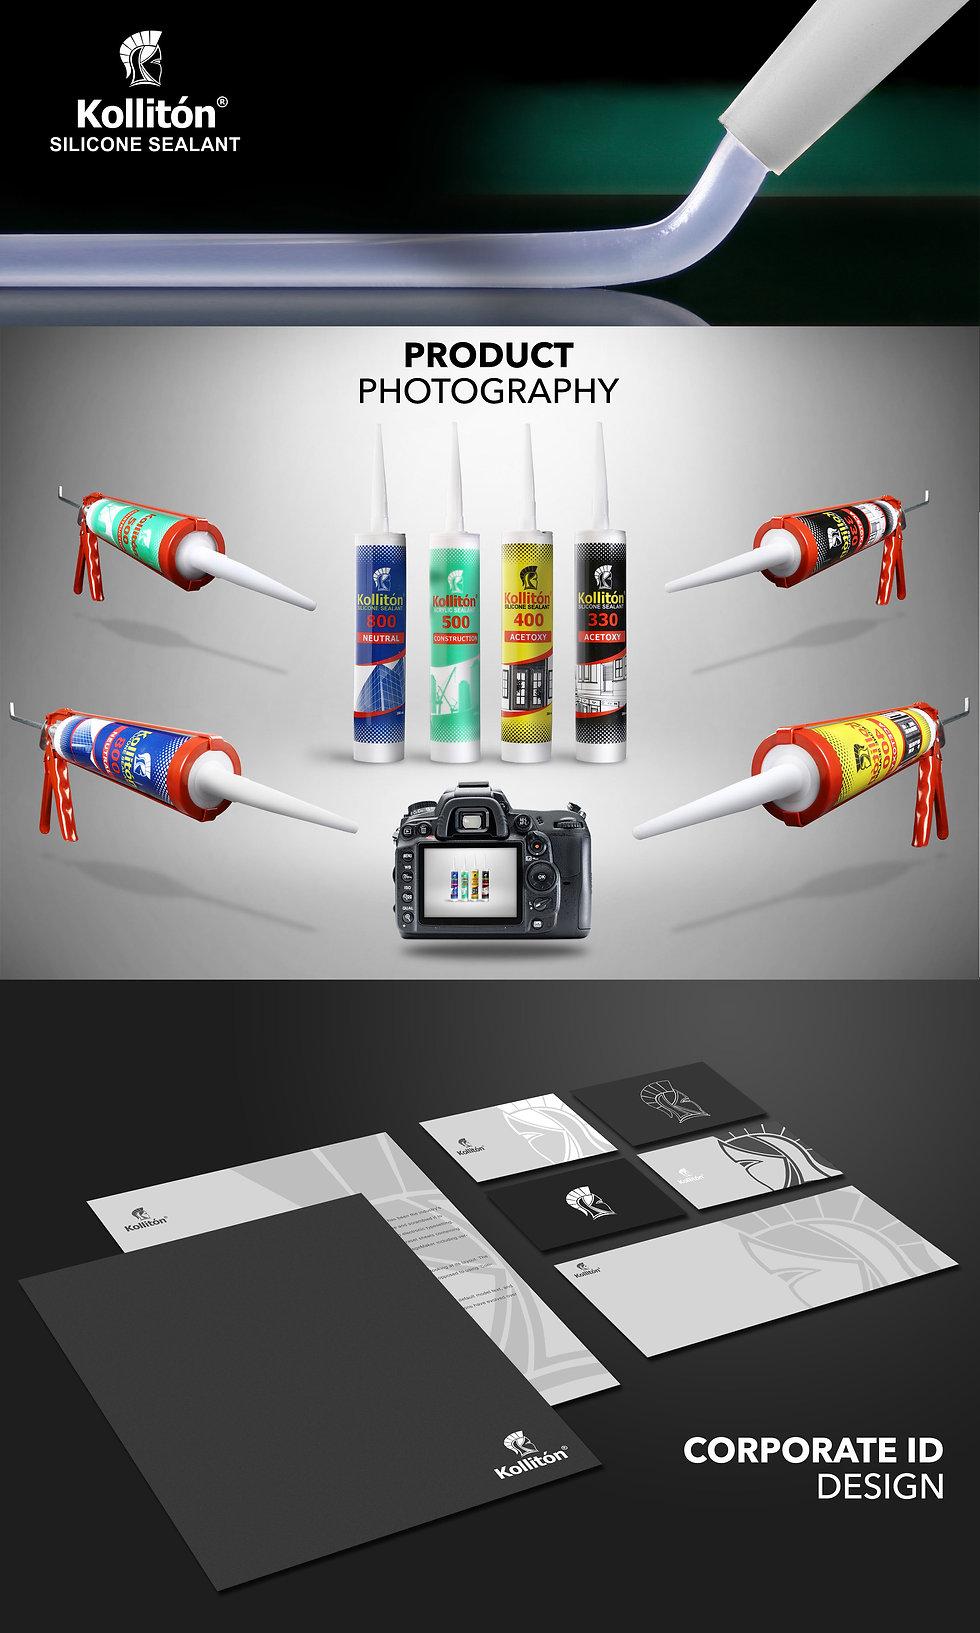 Jasa Pembuatan Branding, Jasa Fotografi Surabaya